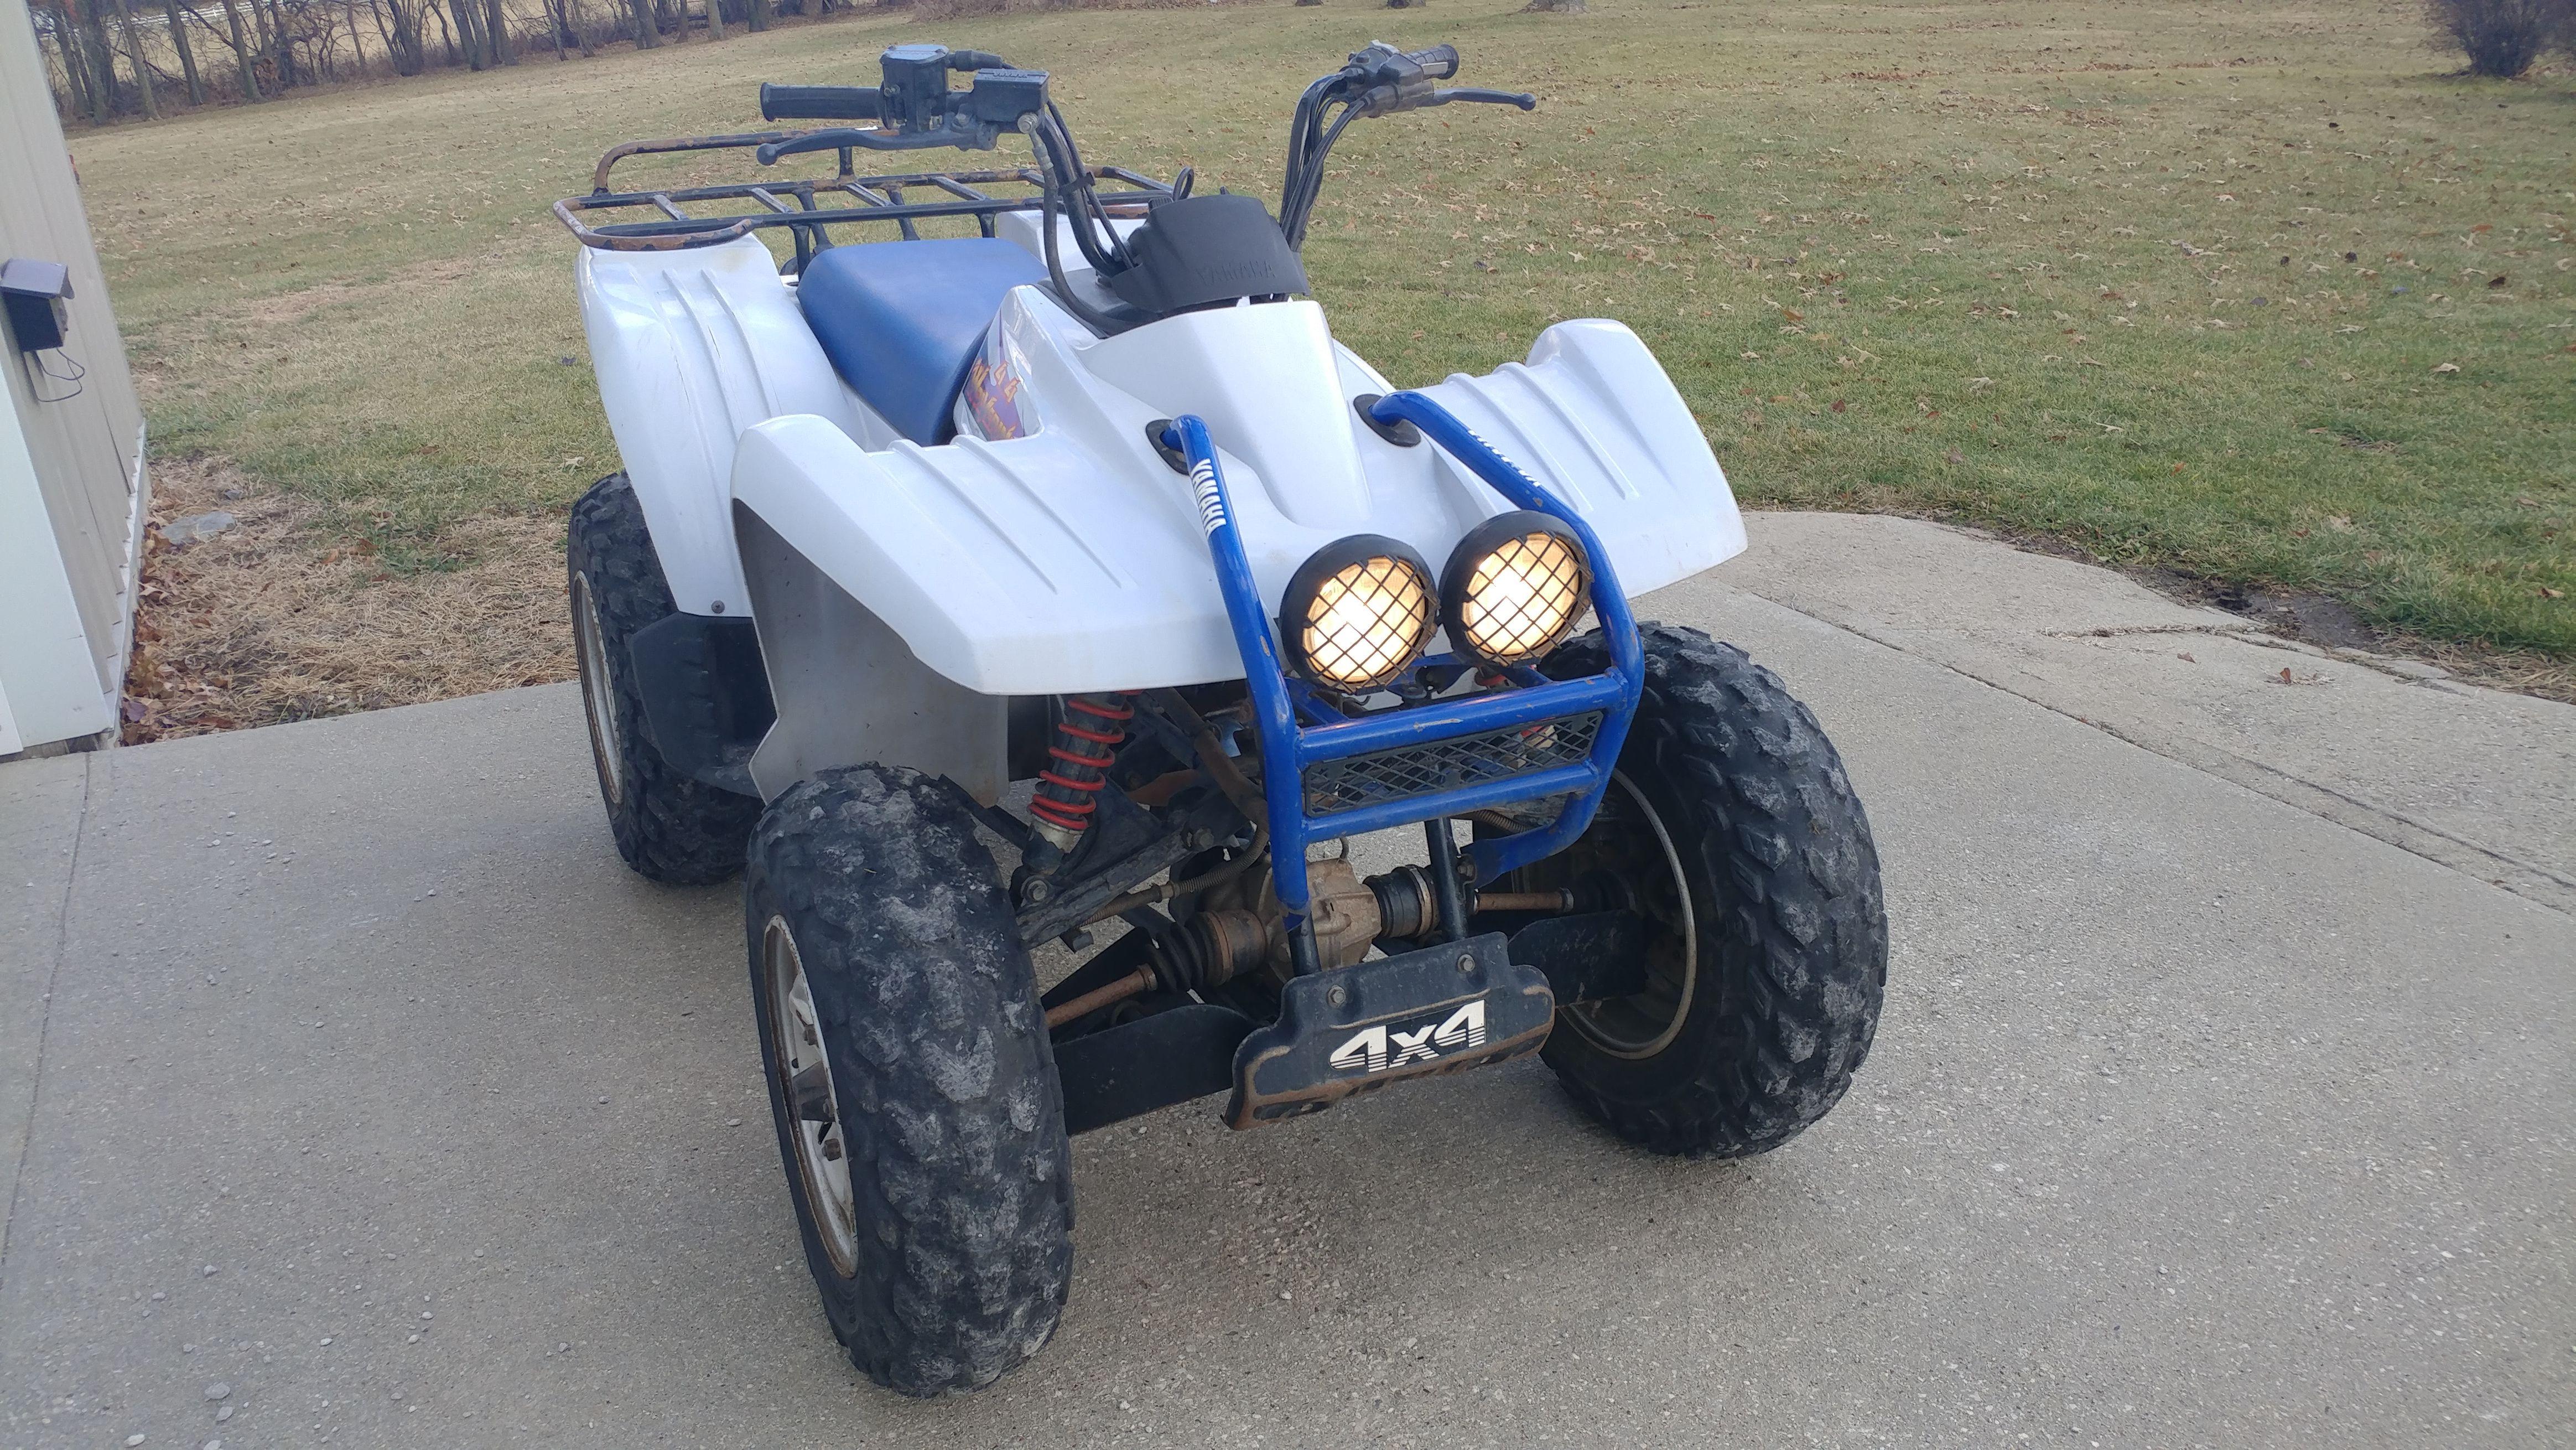 Yamaha 350 4X4 4 wheeler image 1